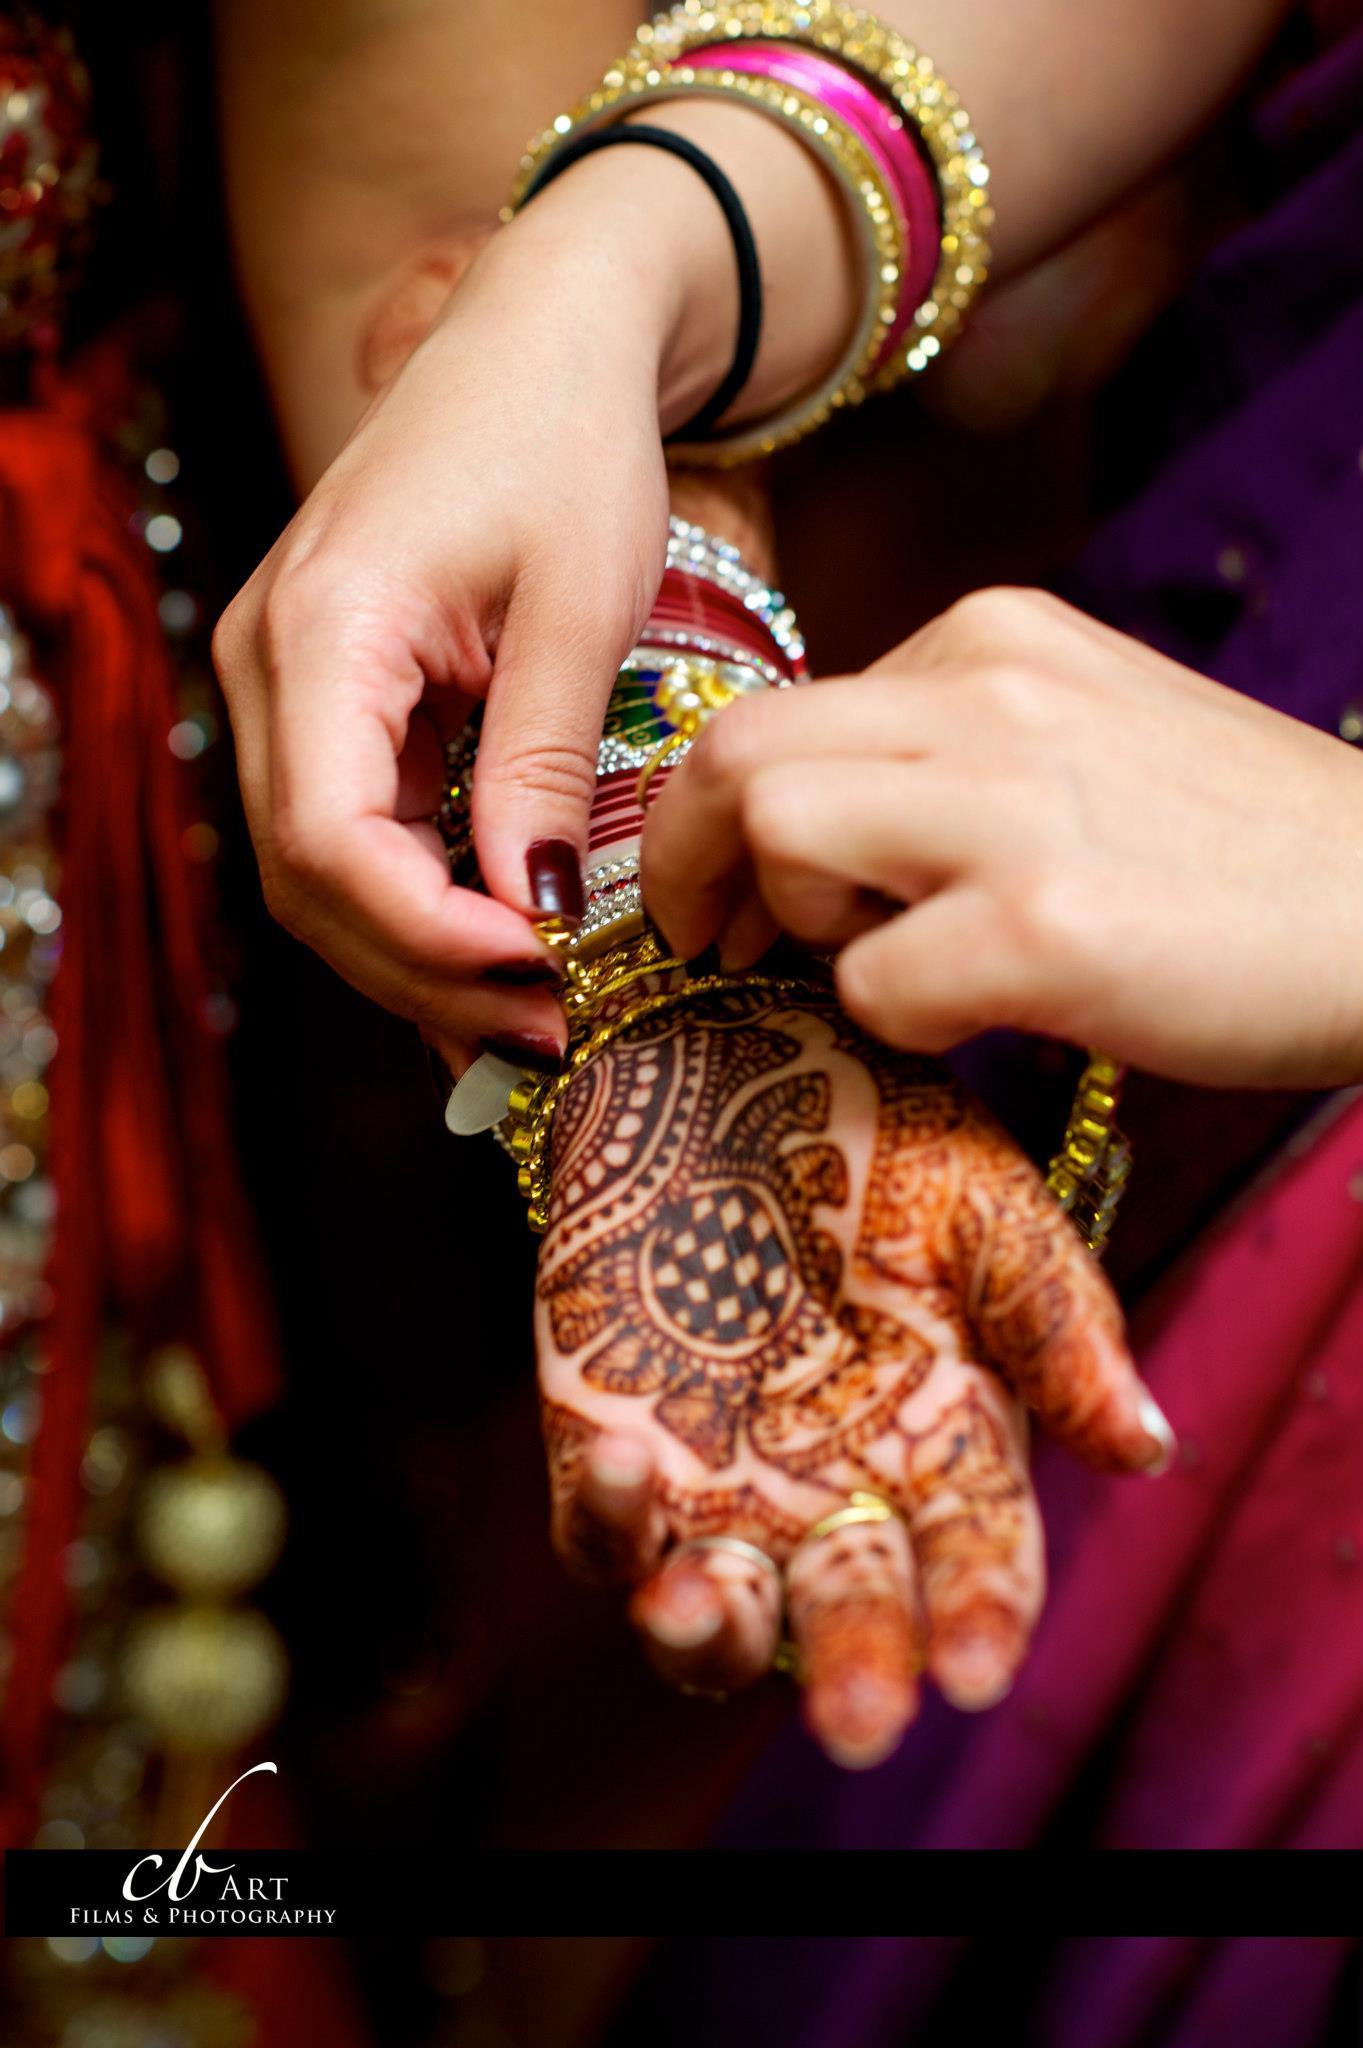 Sikh Wedding   Venue:  Willard Intercontinental Hotel   Photo & Video:  CB Art   Planning:  Malenia Events